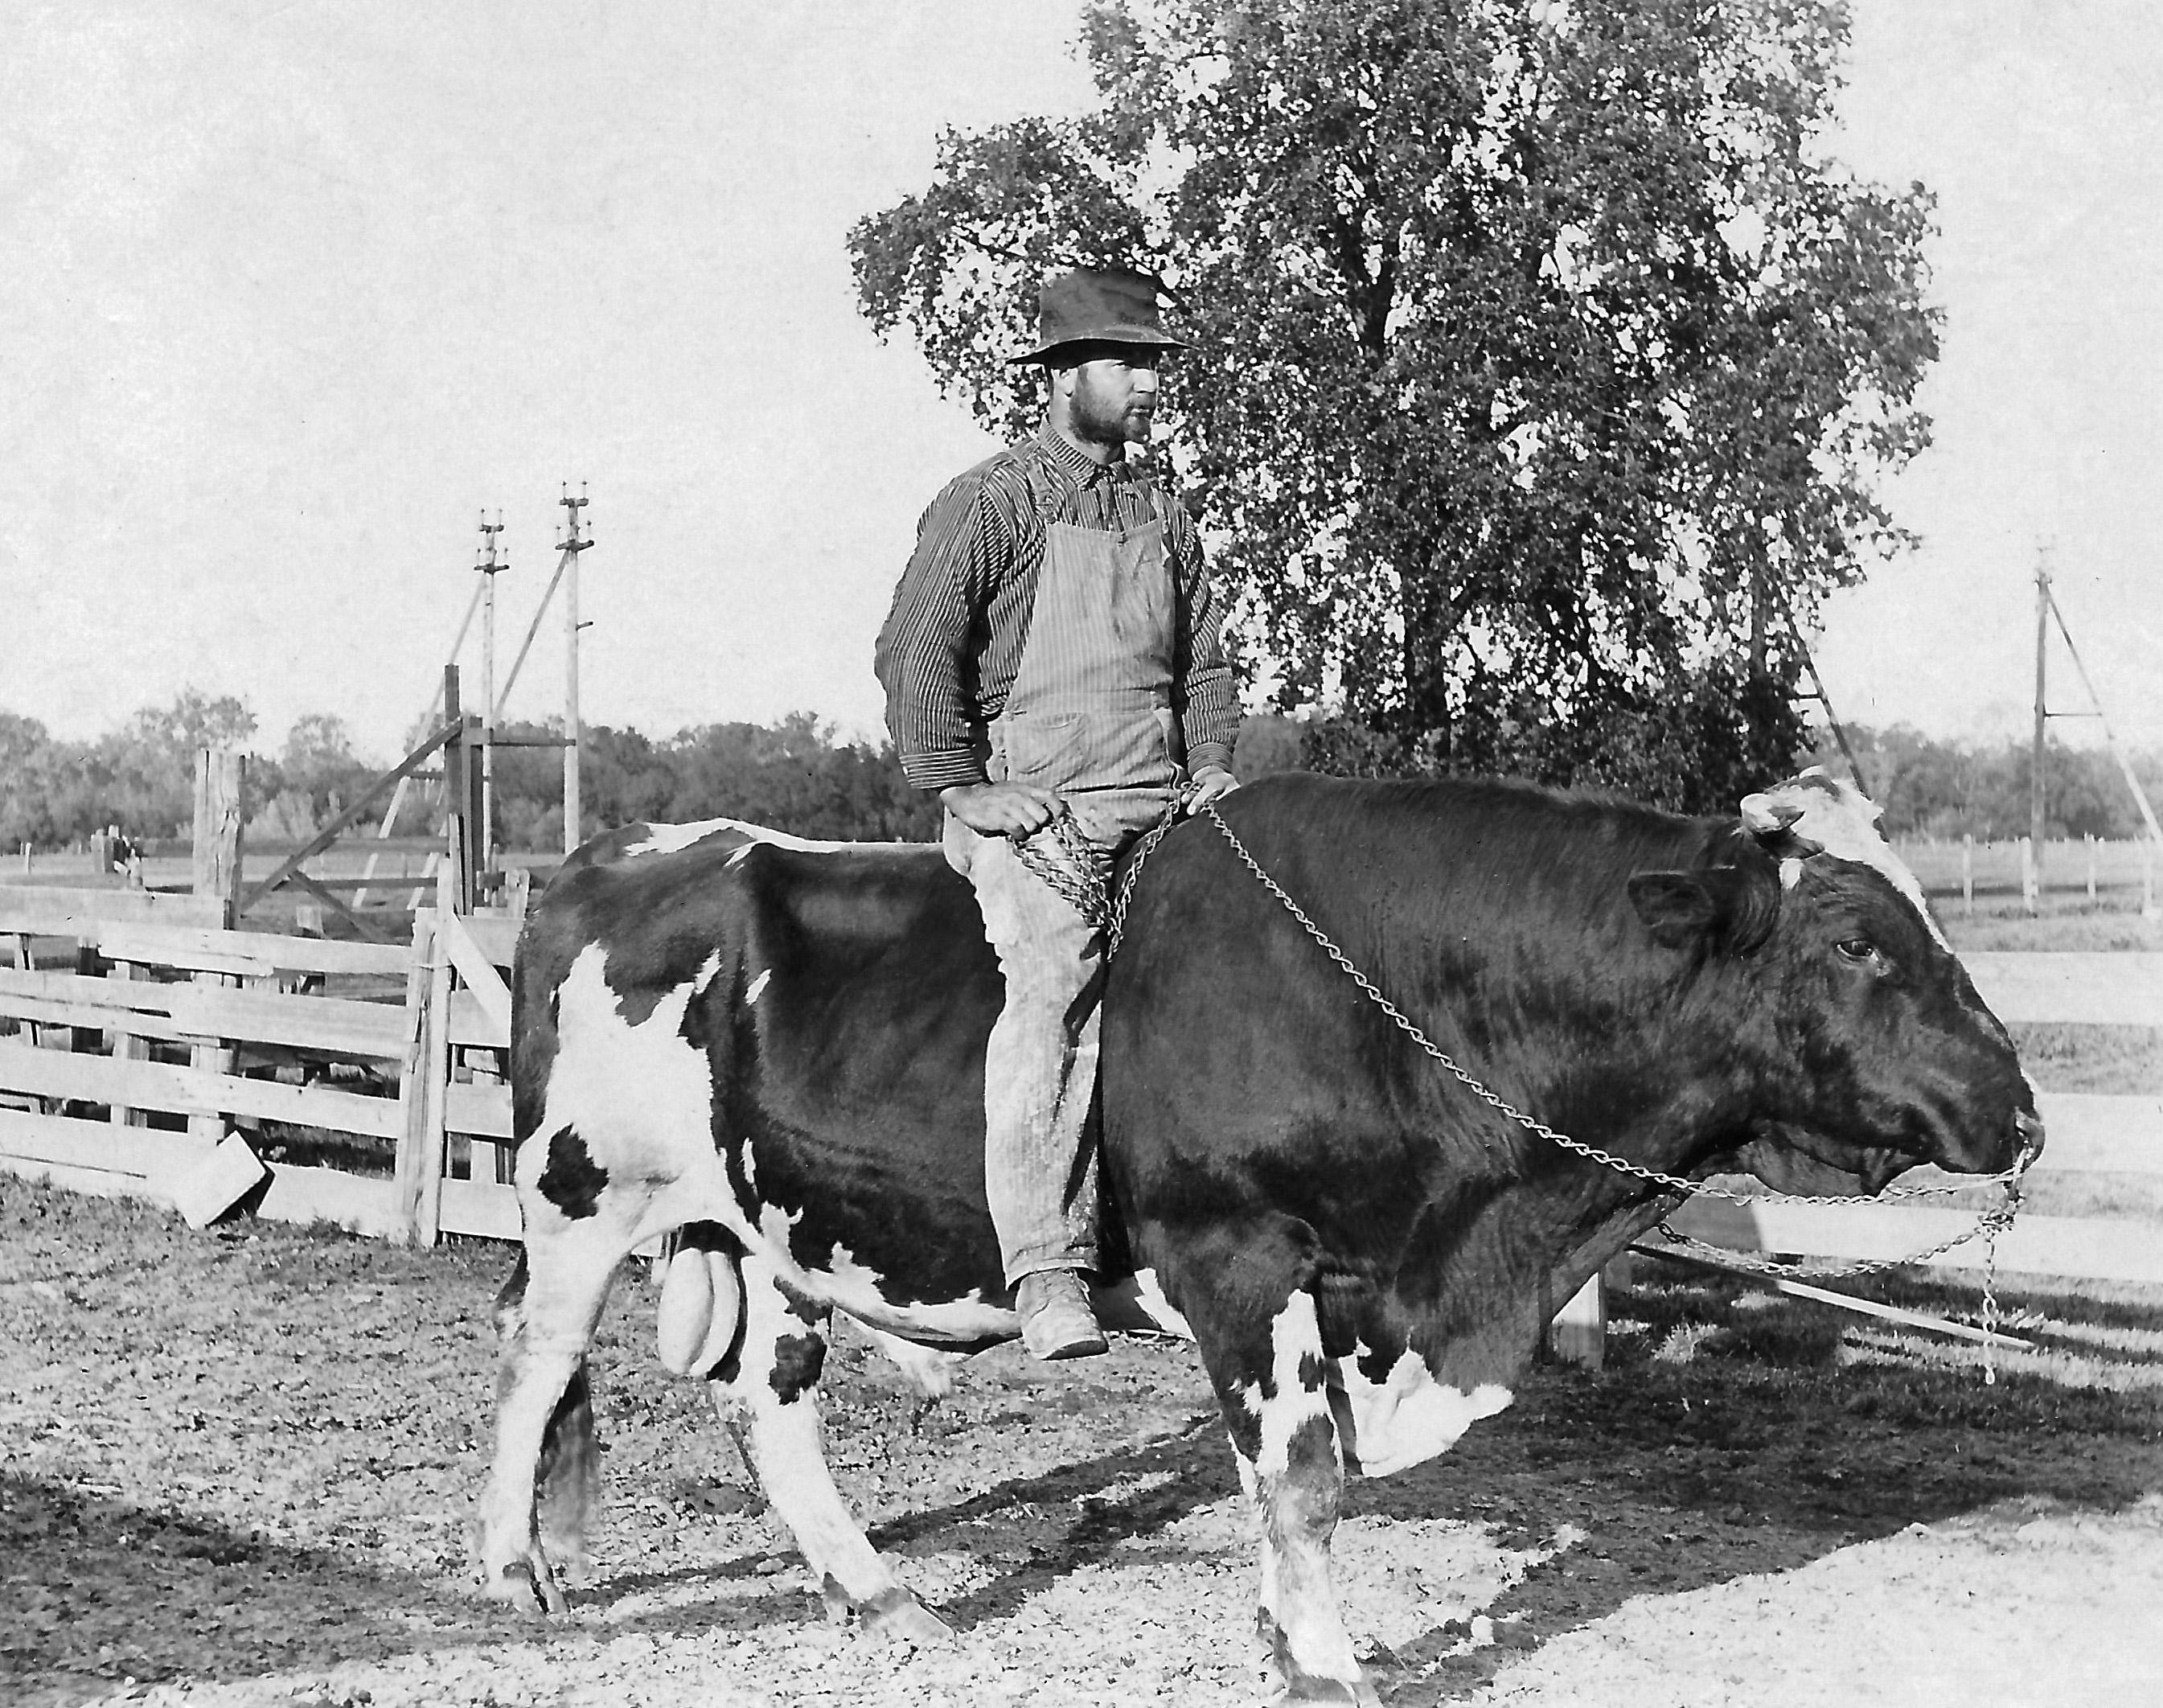 Bull Rider BW